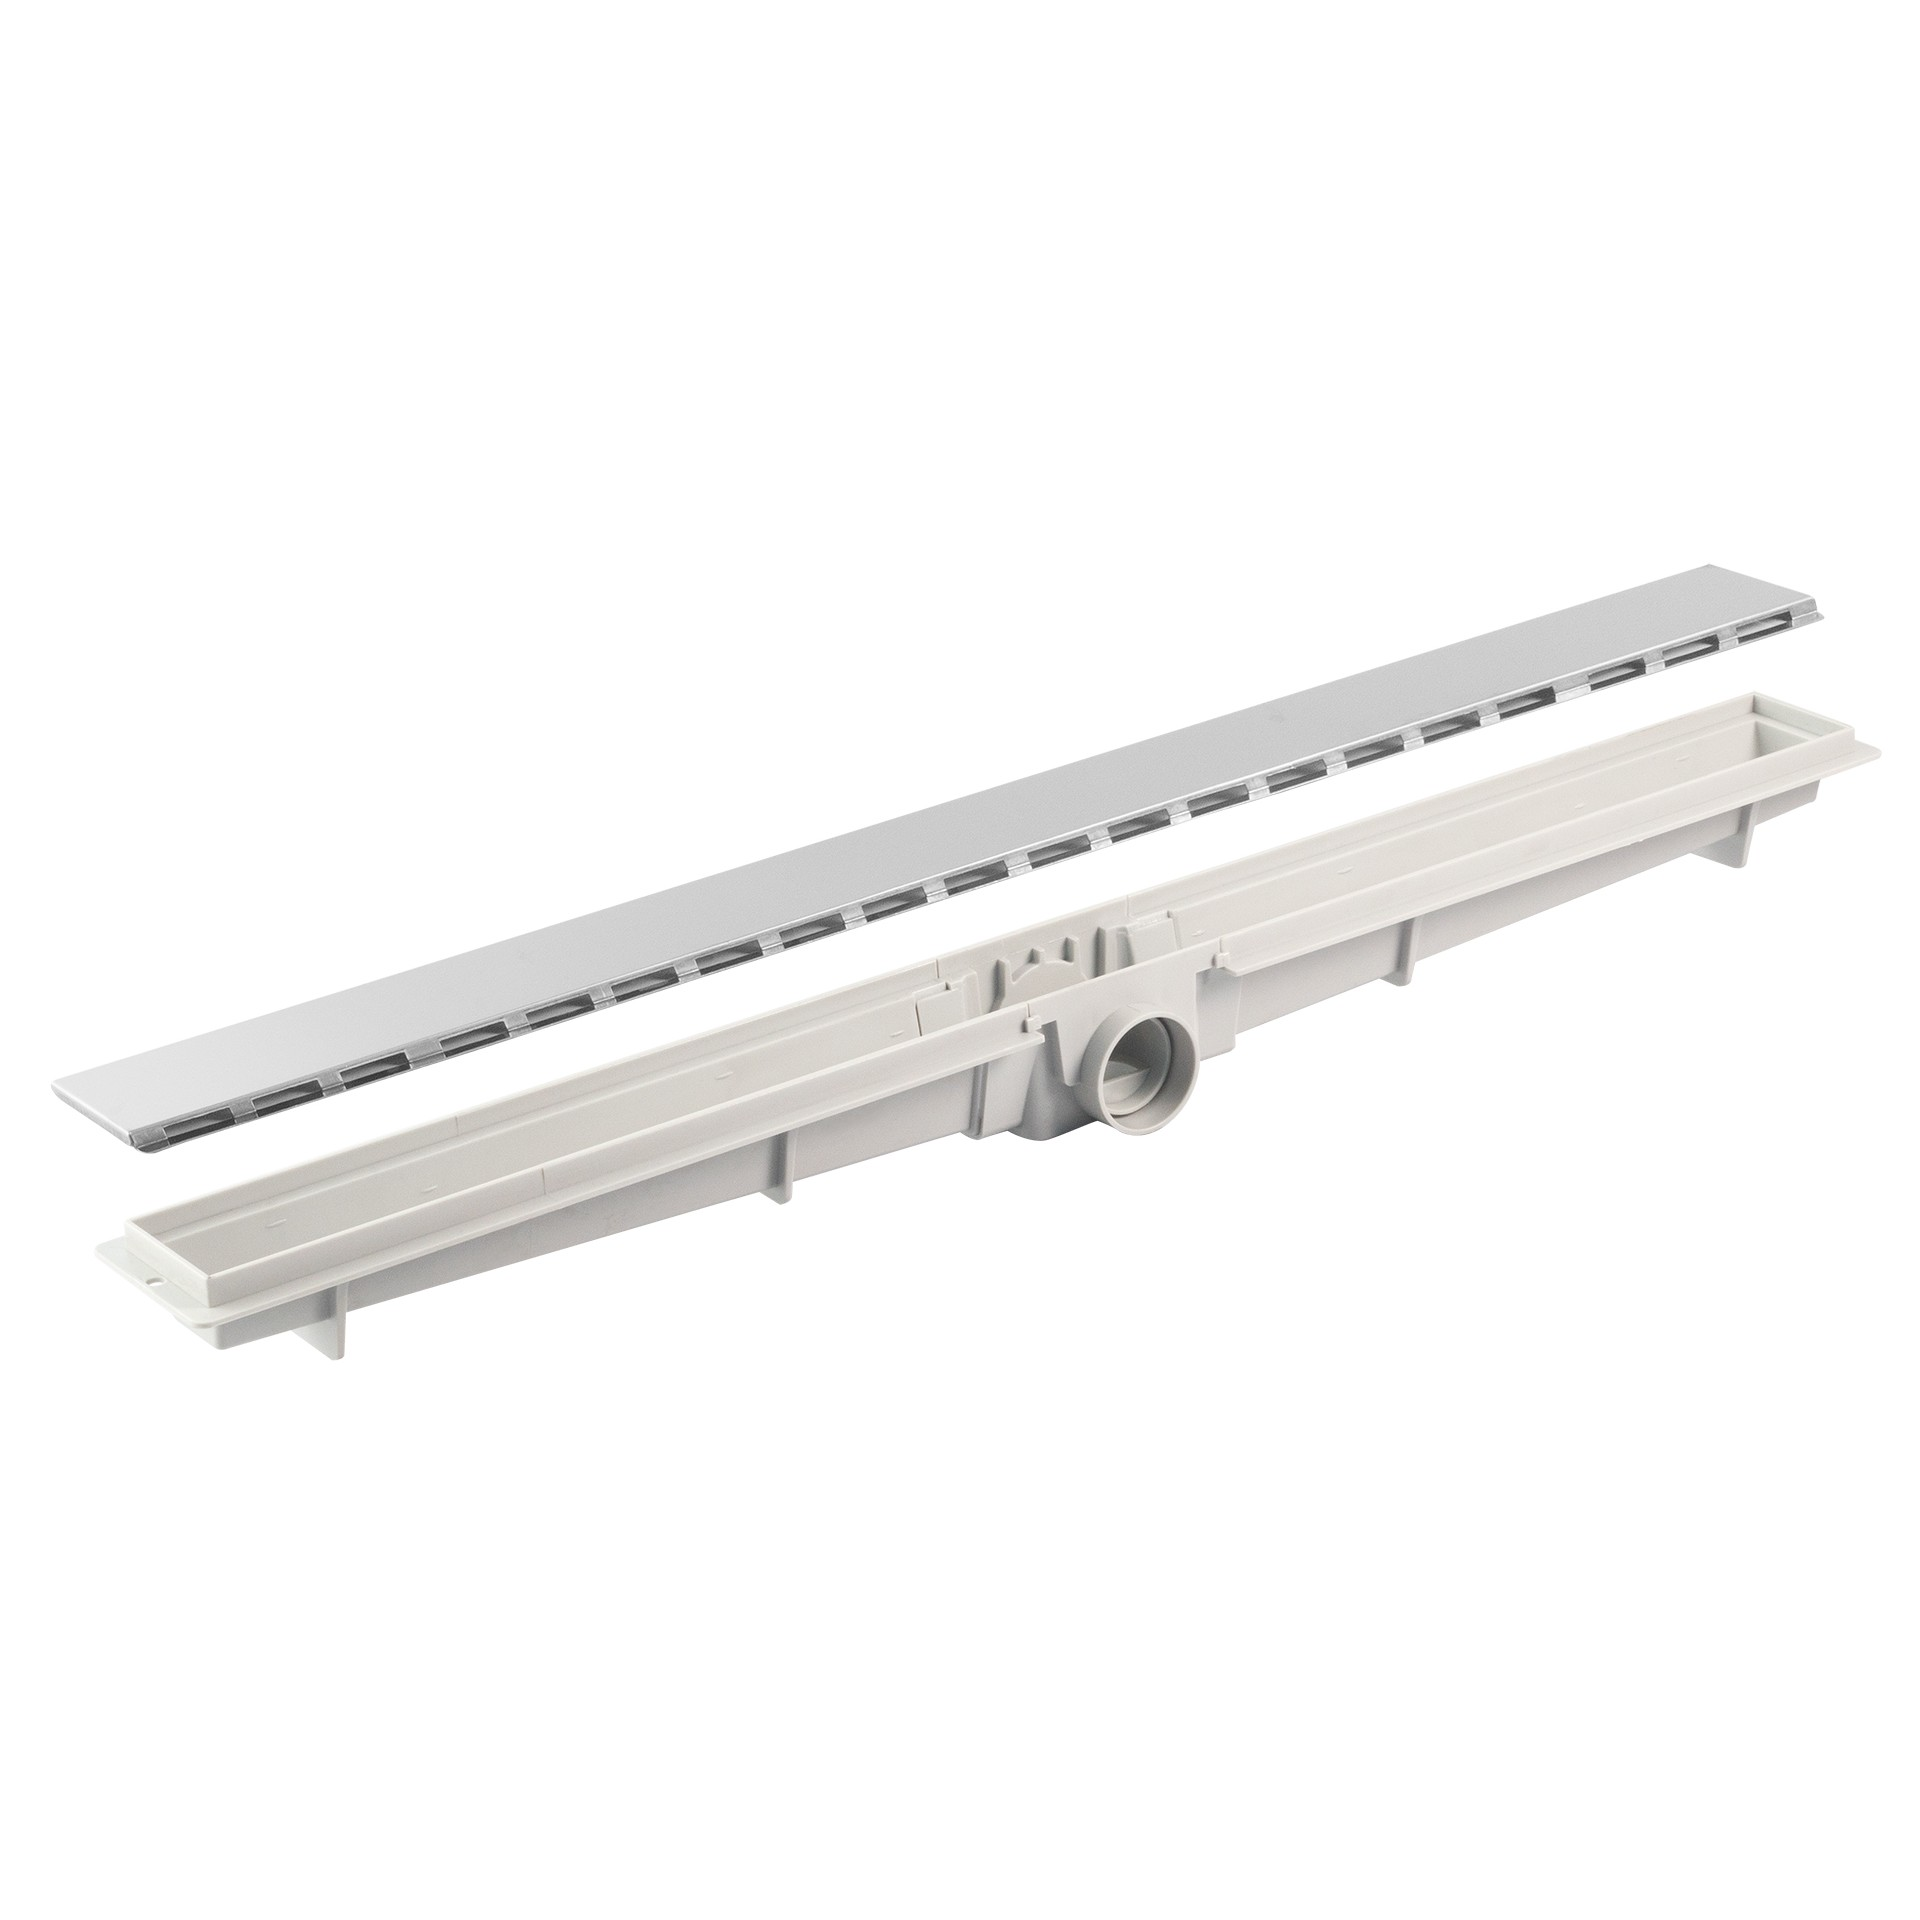 Ralo de Aco Inox Linear Flat 5 x 50 cm - LGMais